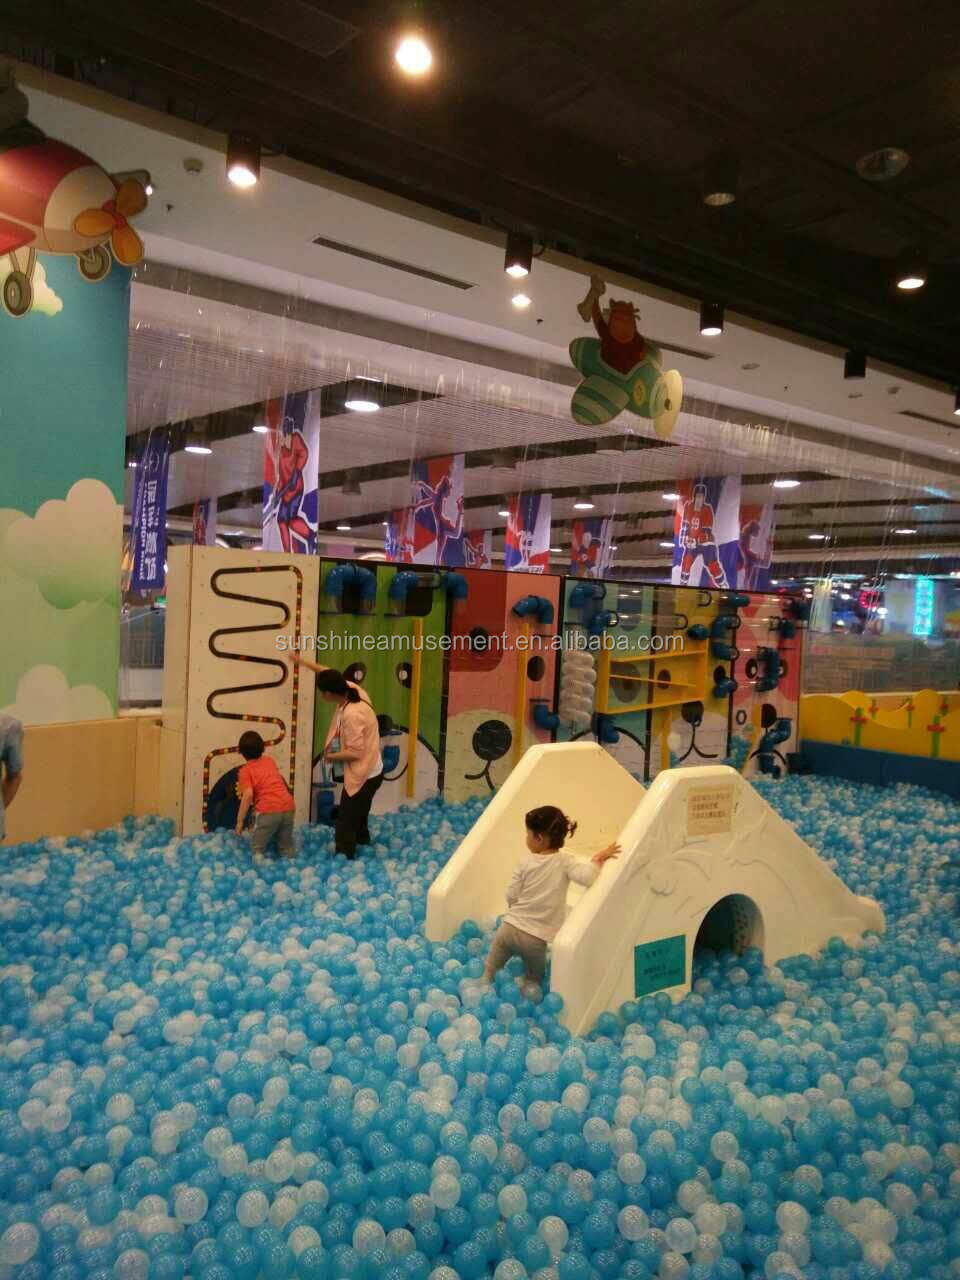 Indoor Preschool Playground Equipment From Sunshine Ocean Ball Games ...